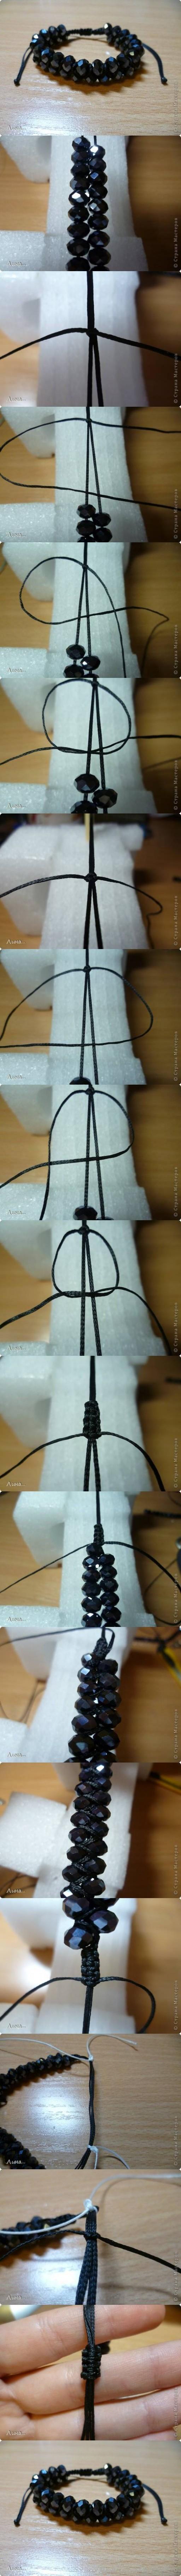 How to make Dual Shambhala Bracelet step by step DIY tutorial instructions